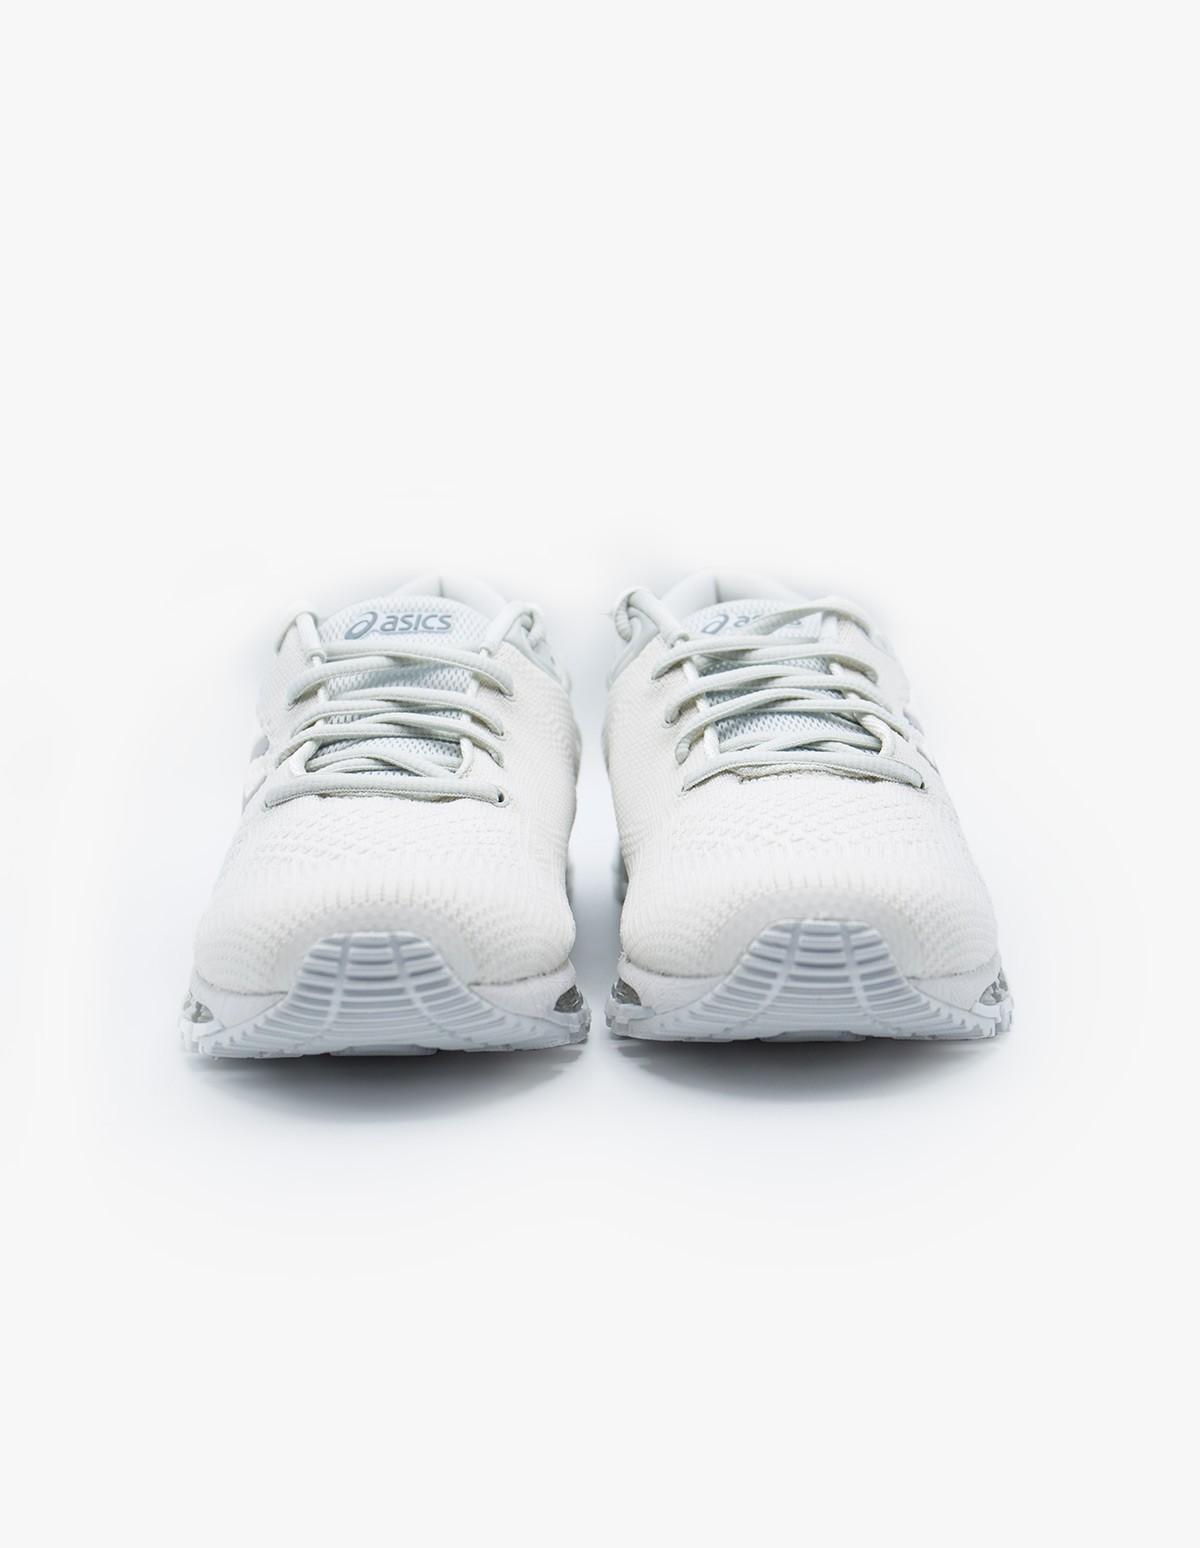 Asics Gel Quantum 360 Knit 3 in Glacier Grey / White